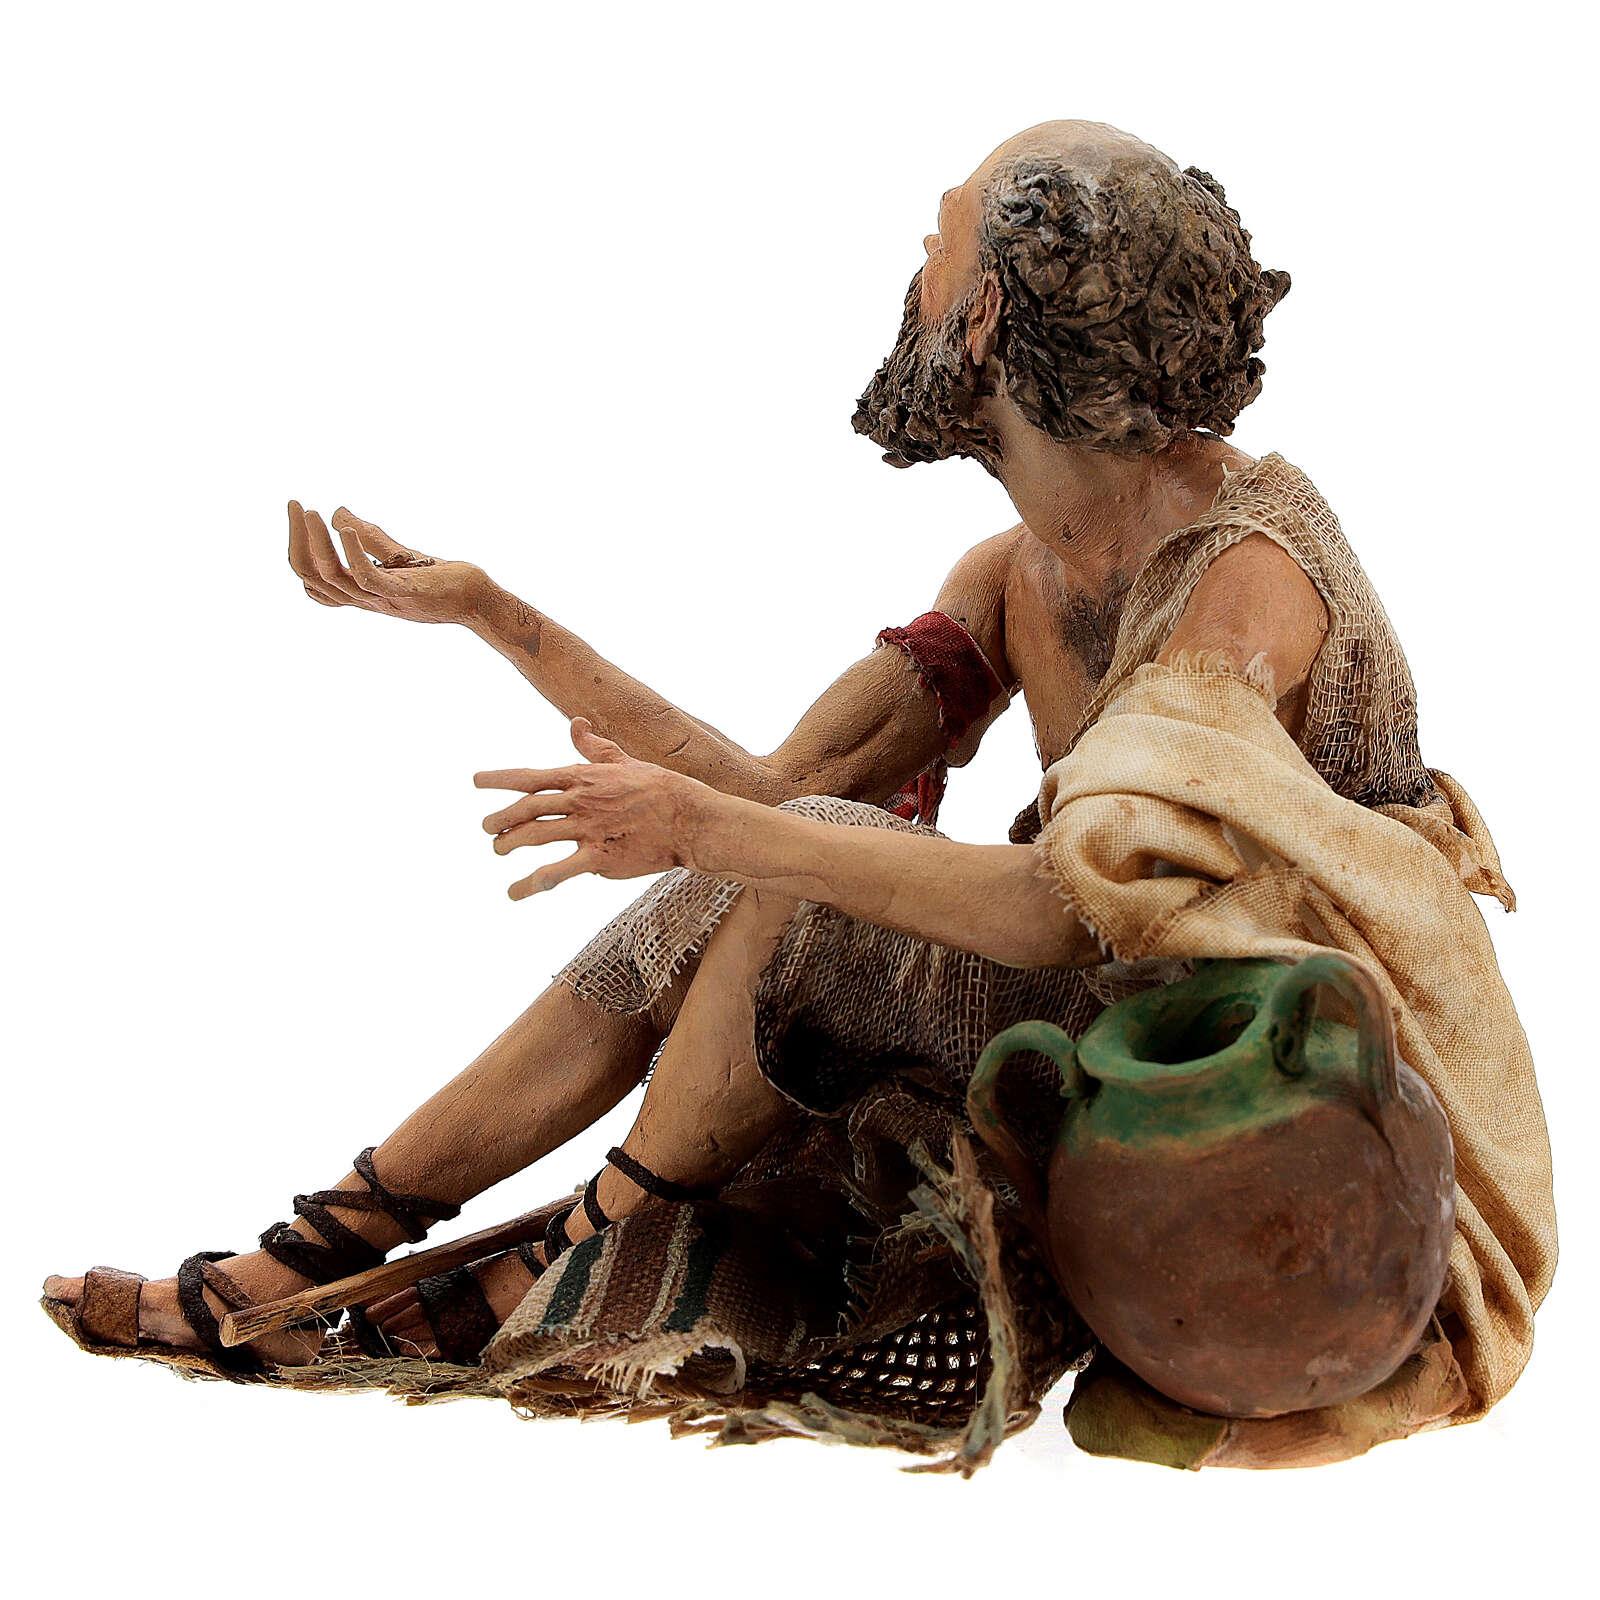 Estropié 18 cm crèche Angela Tripi 4